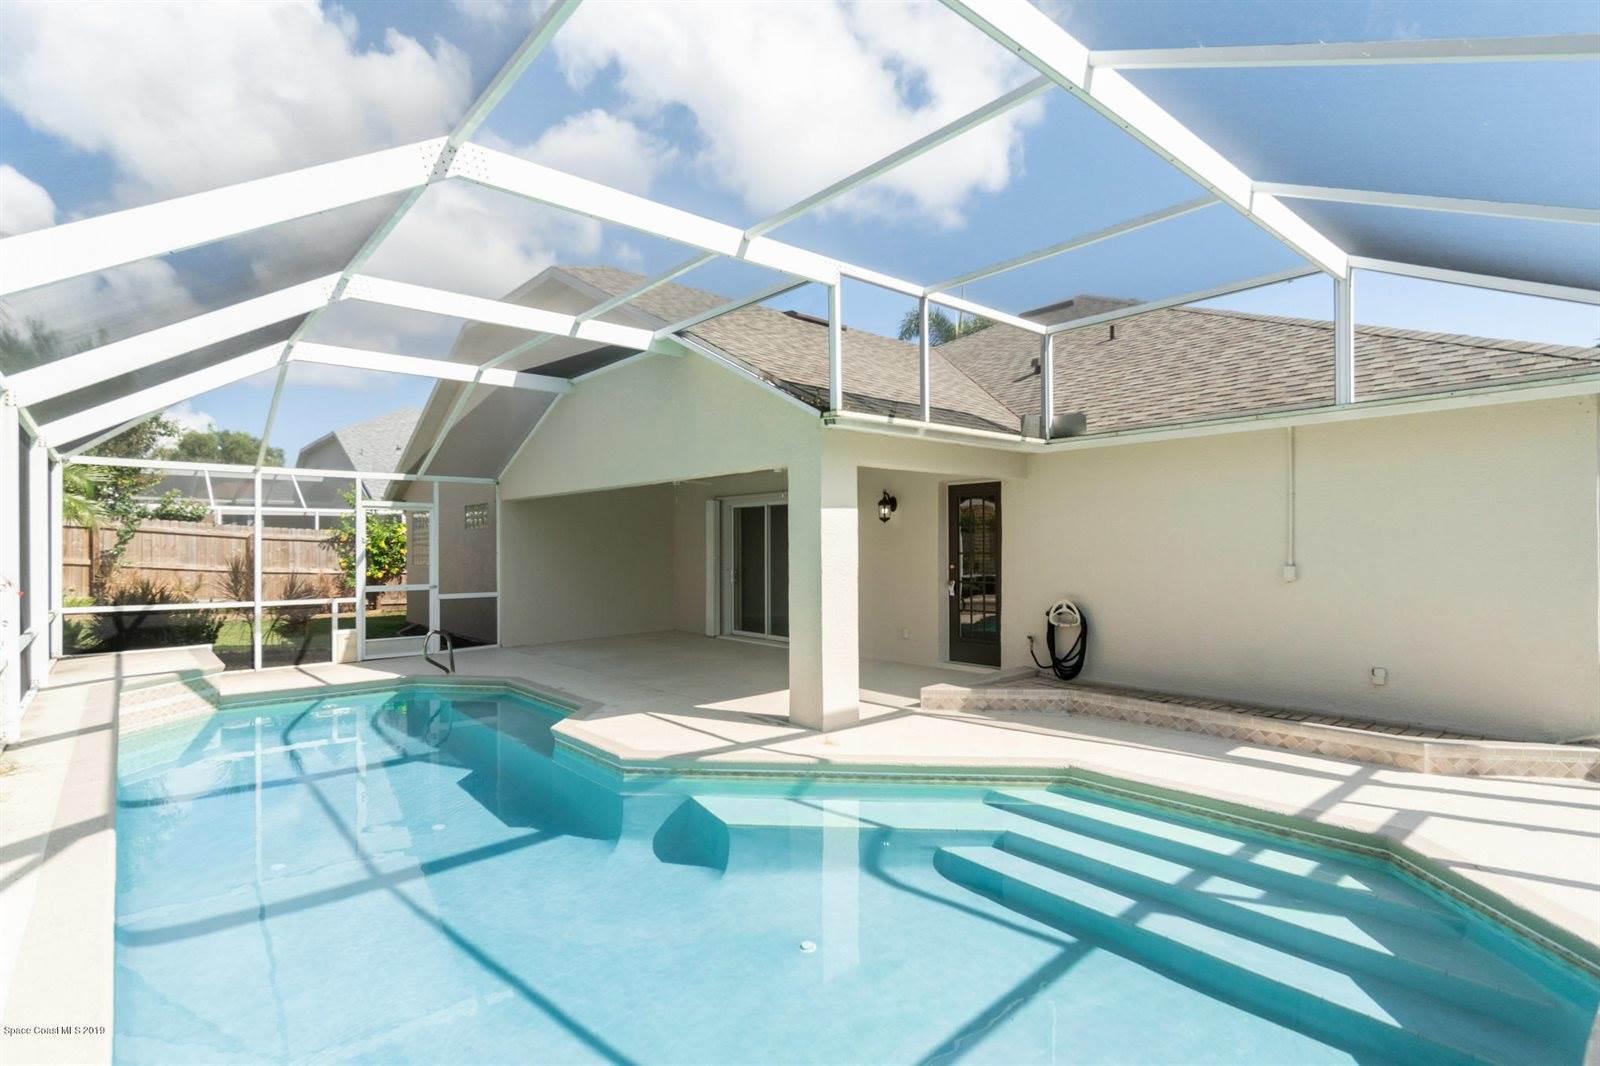 653 Heather Stone Drive, Merritt Island, FL 32953